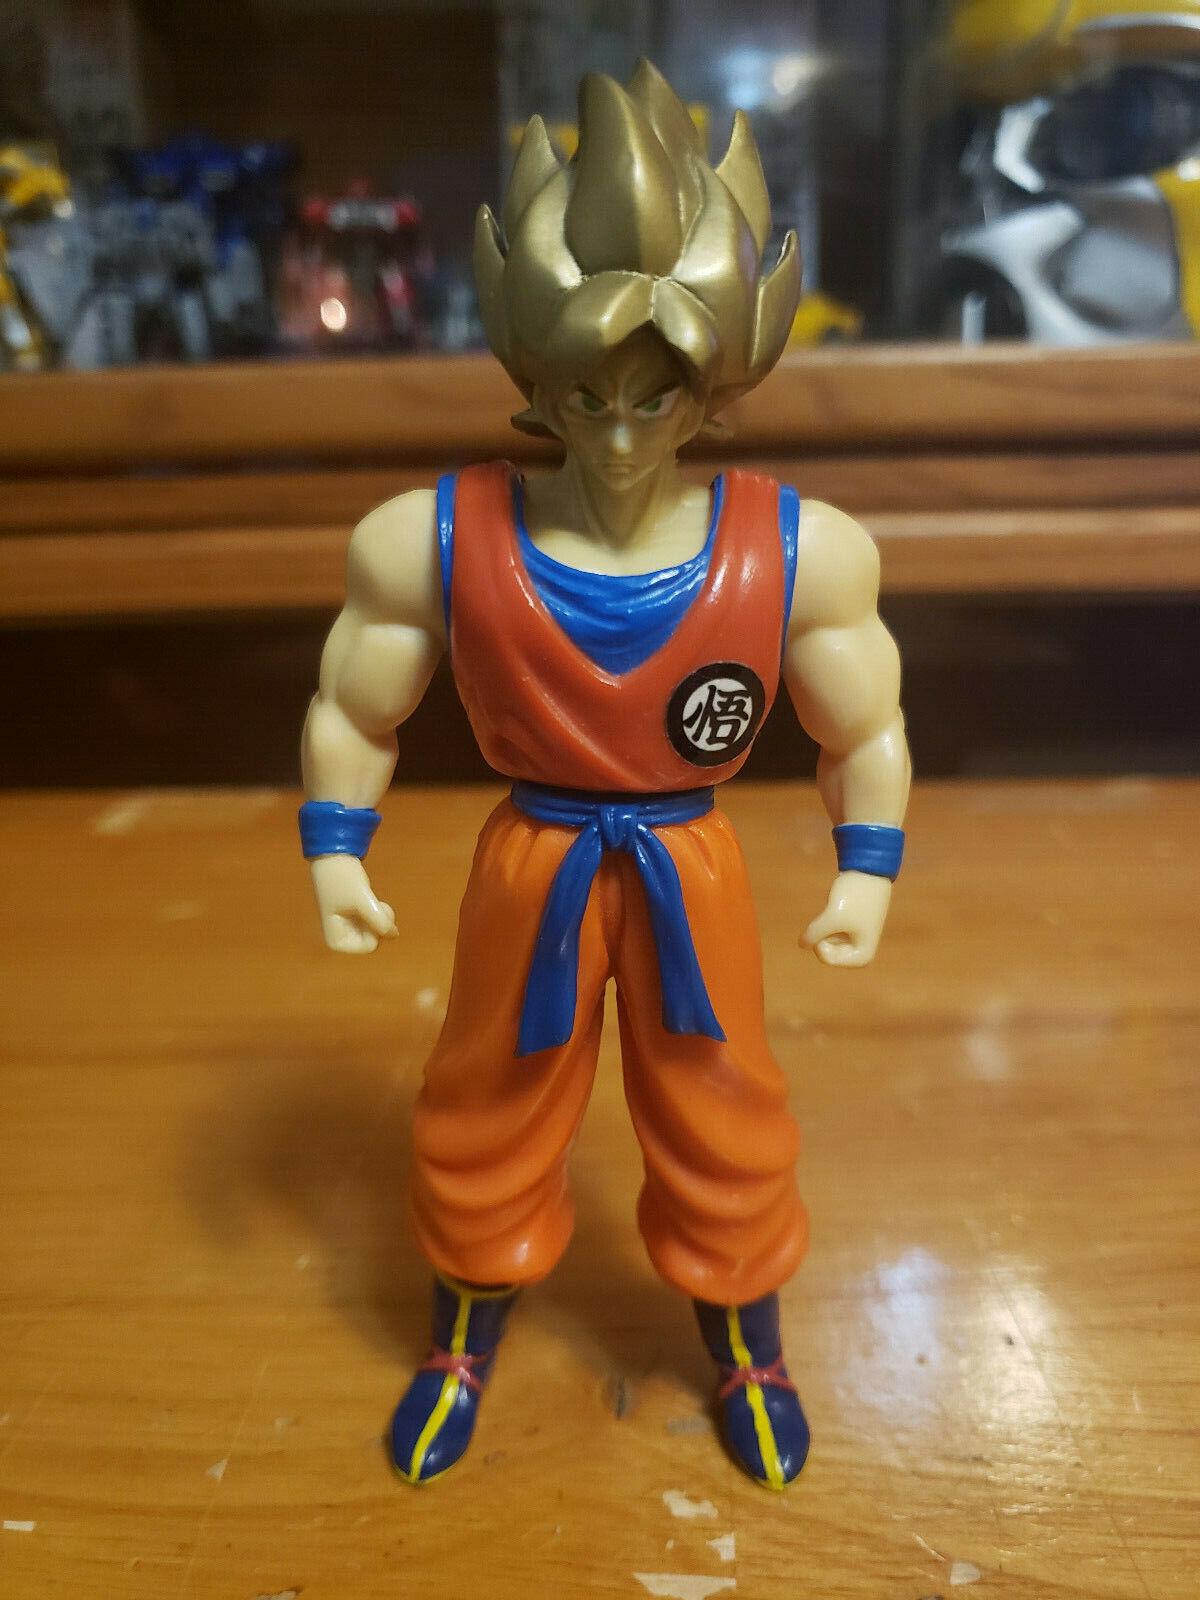 Character:Super Saiyan Goku Vol 2 (Gold hair):BANDAI Dragonball Z  and Dragon Ball GT super battle collection AB Toys & Irwin